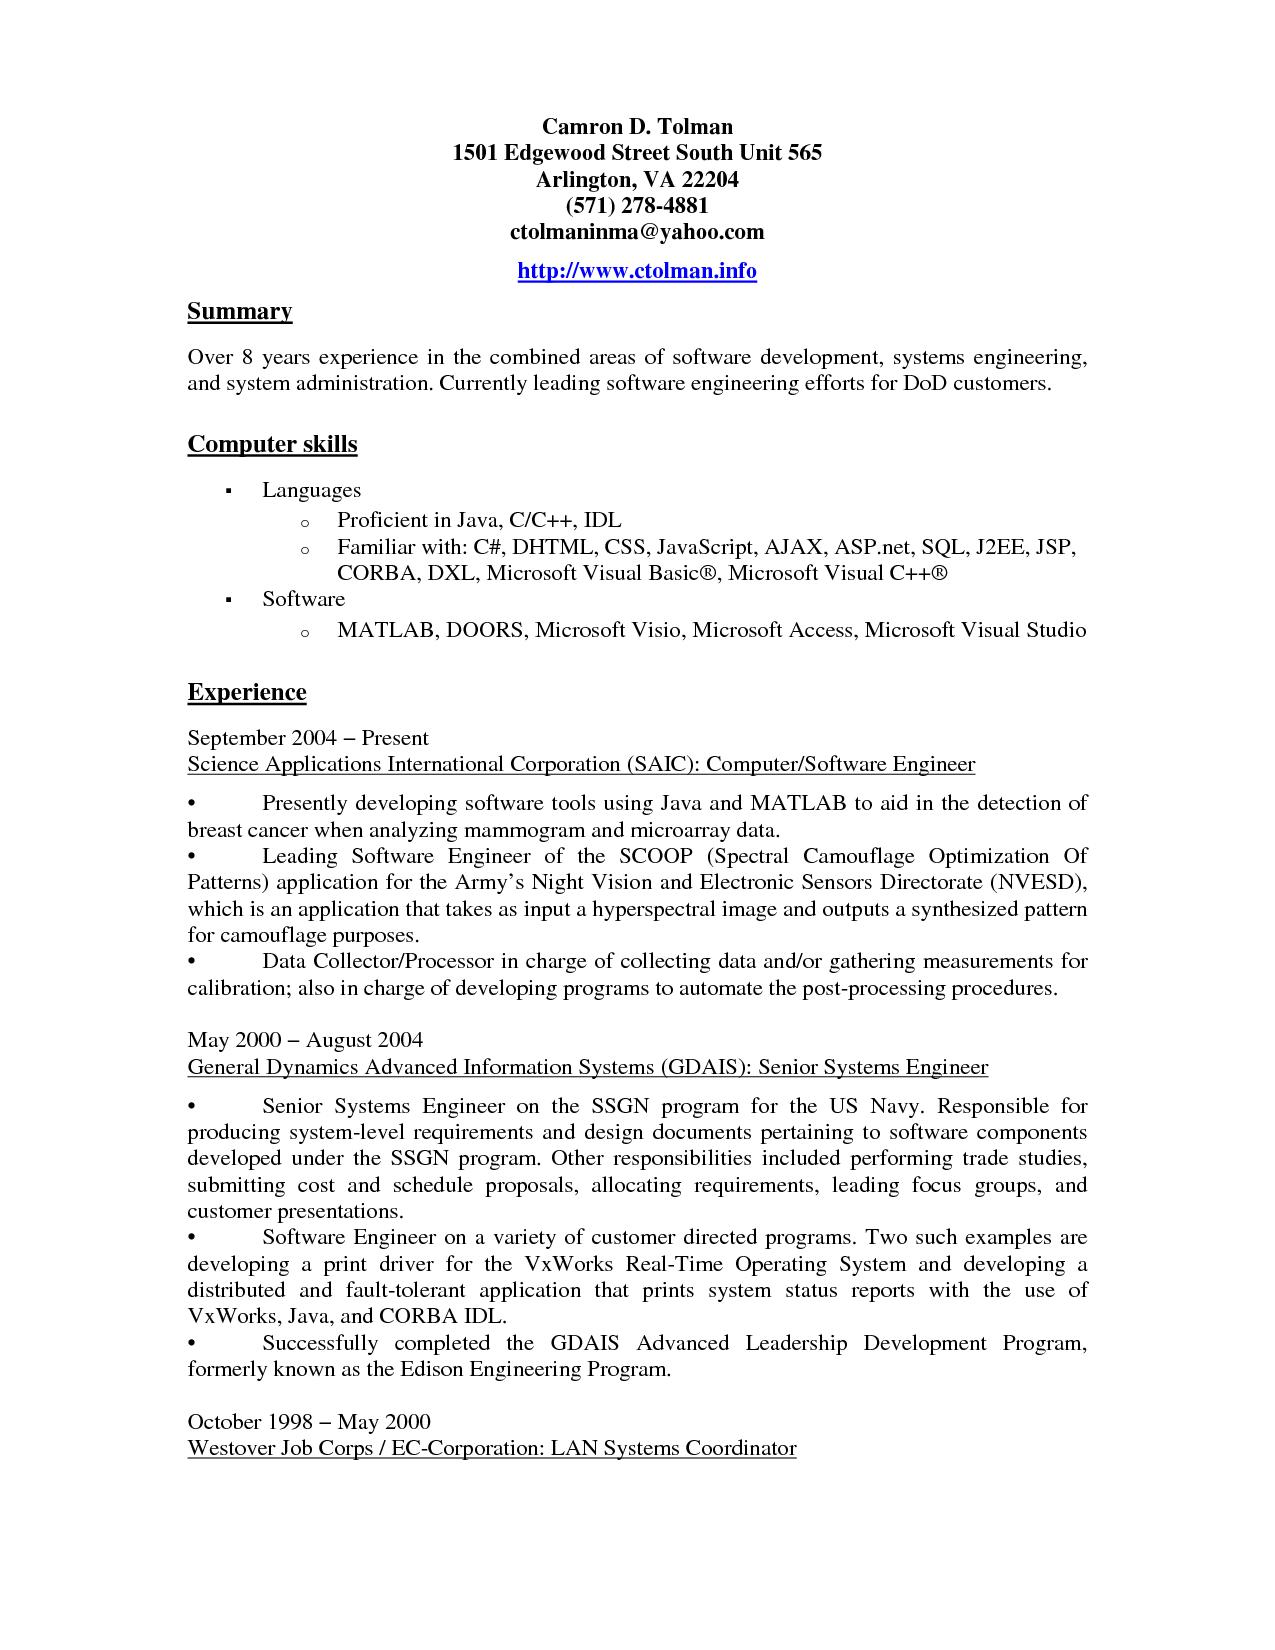 resume format language skills